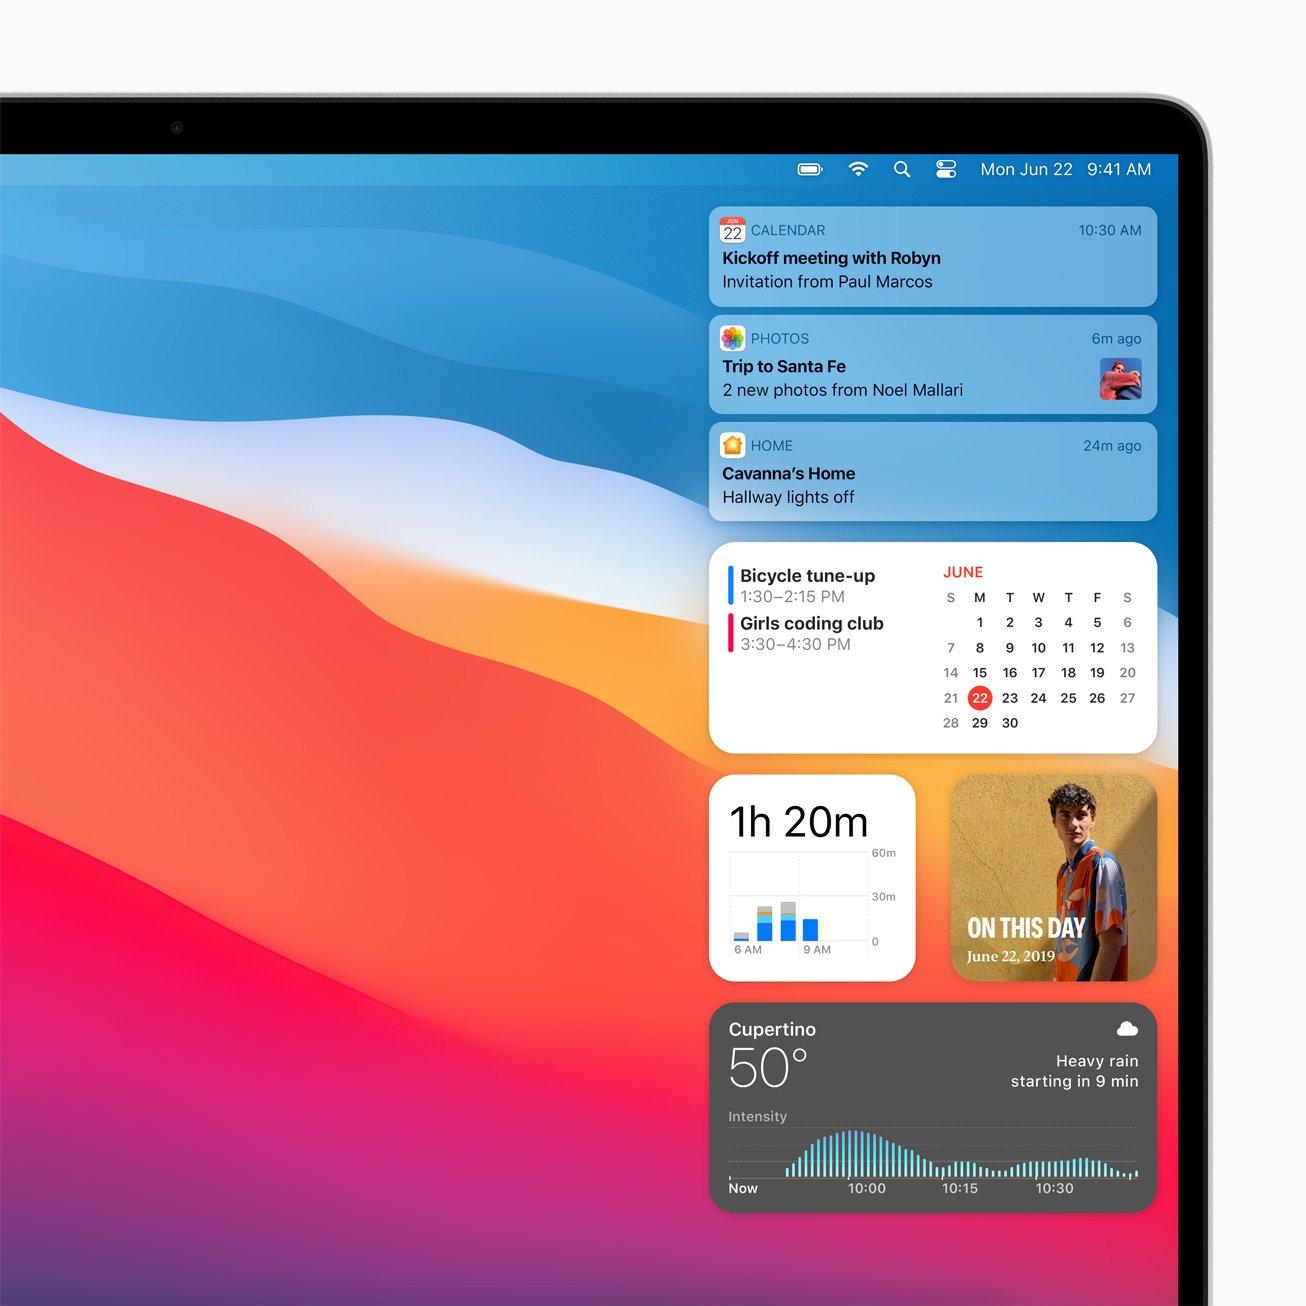 Big Sur的通知中心也作出改进,现在可加入更多不同大小的Widget,方便用户即时获得相关信息。